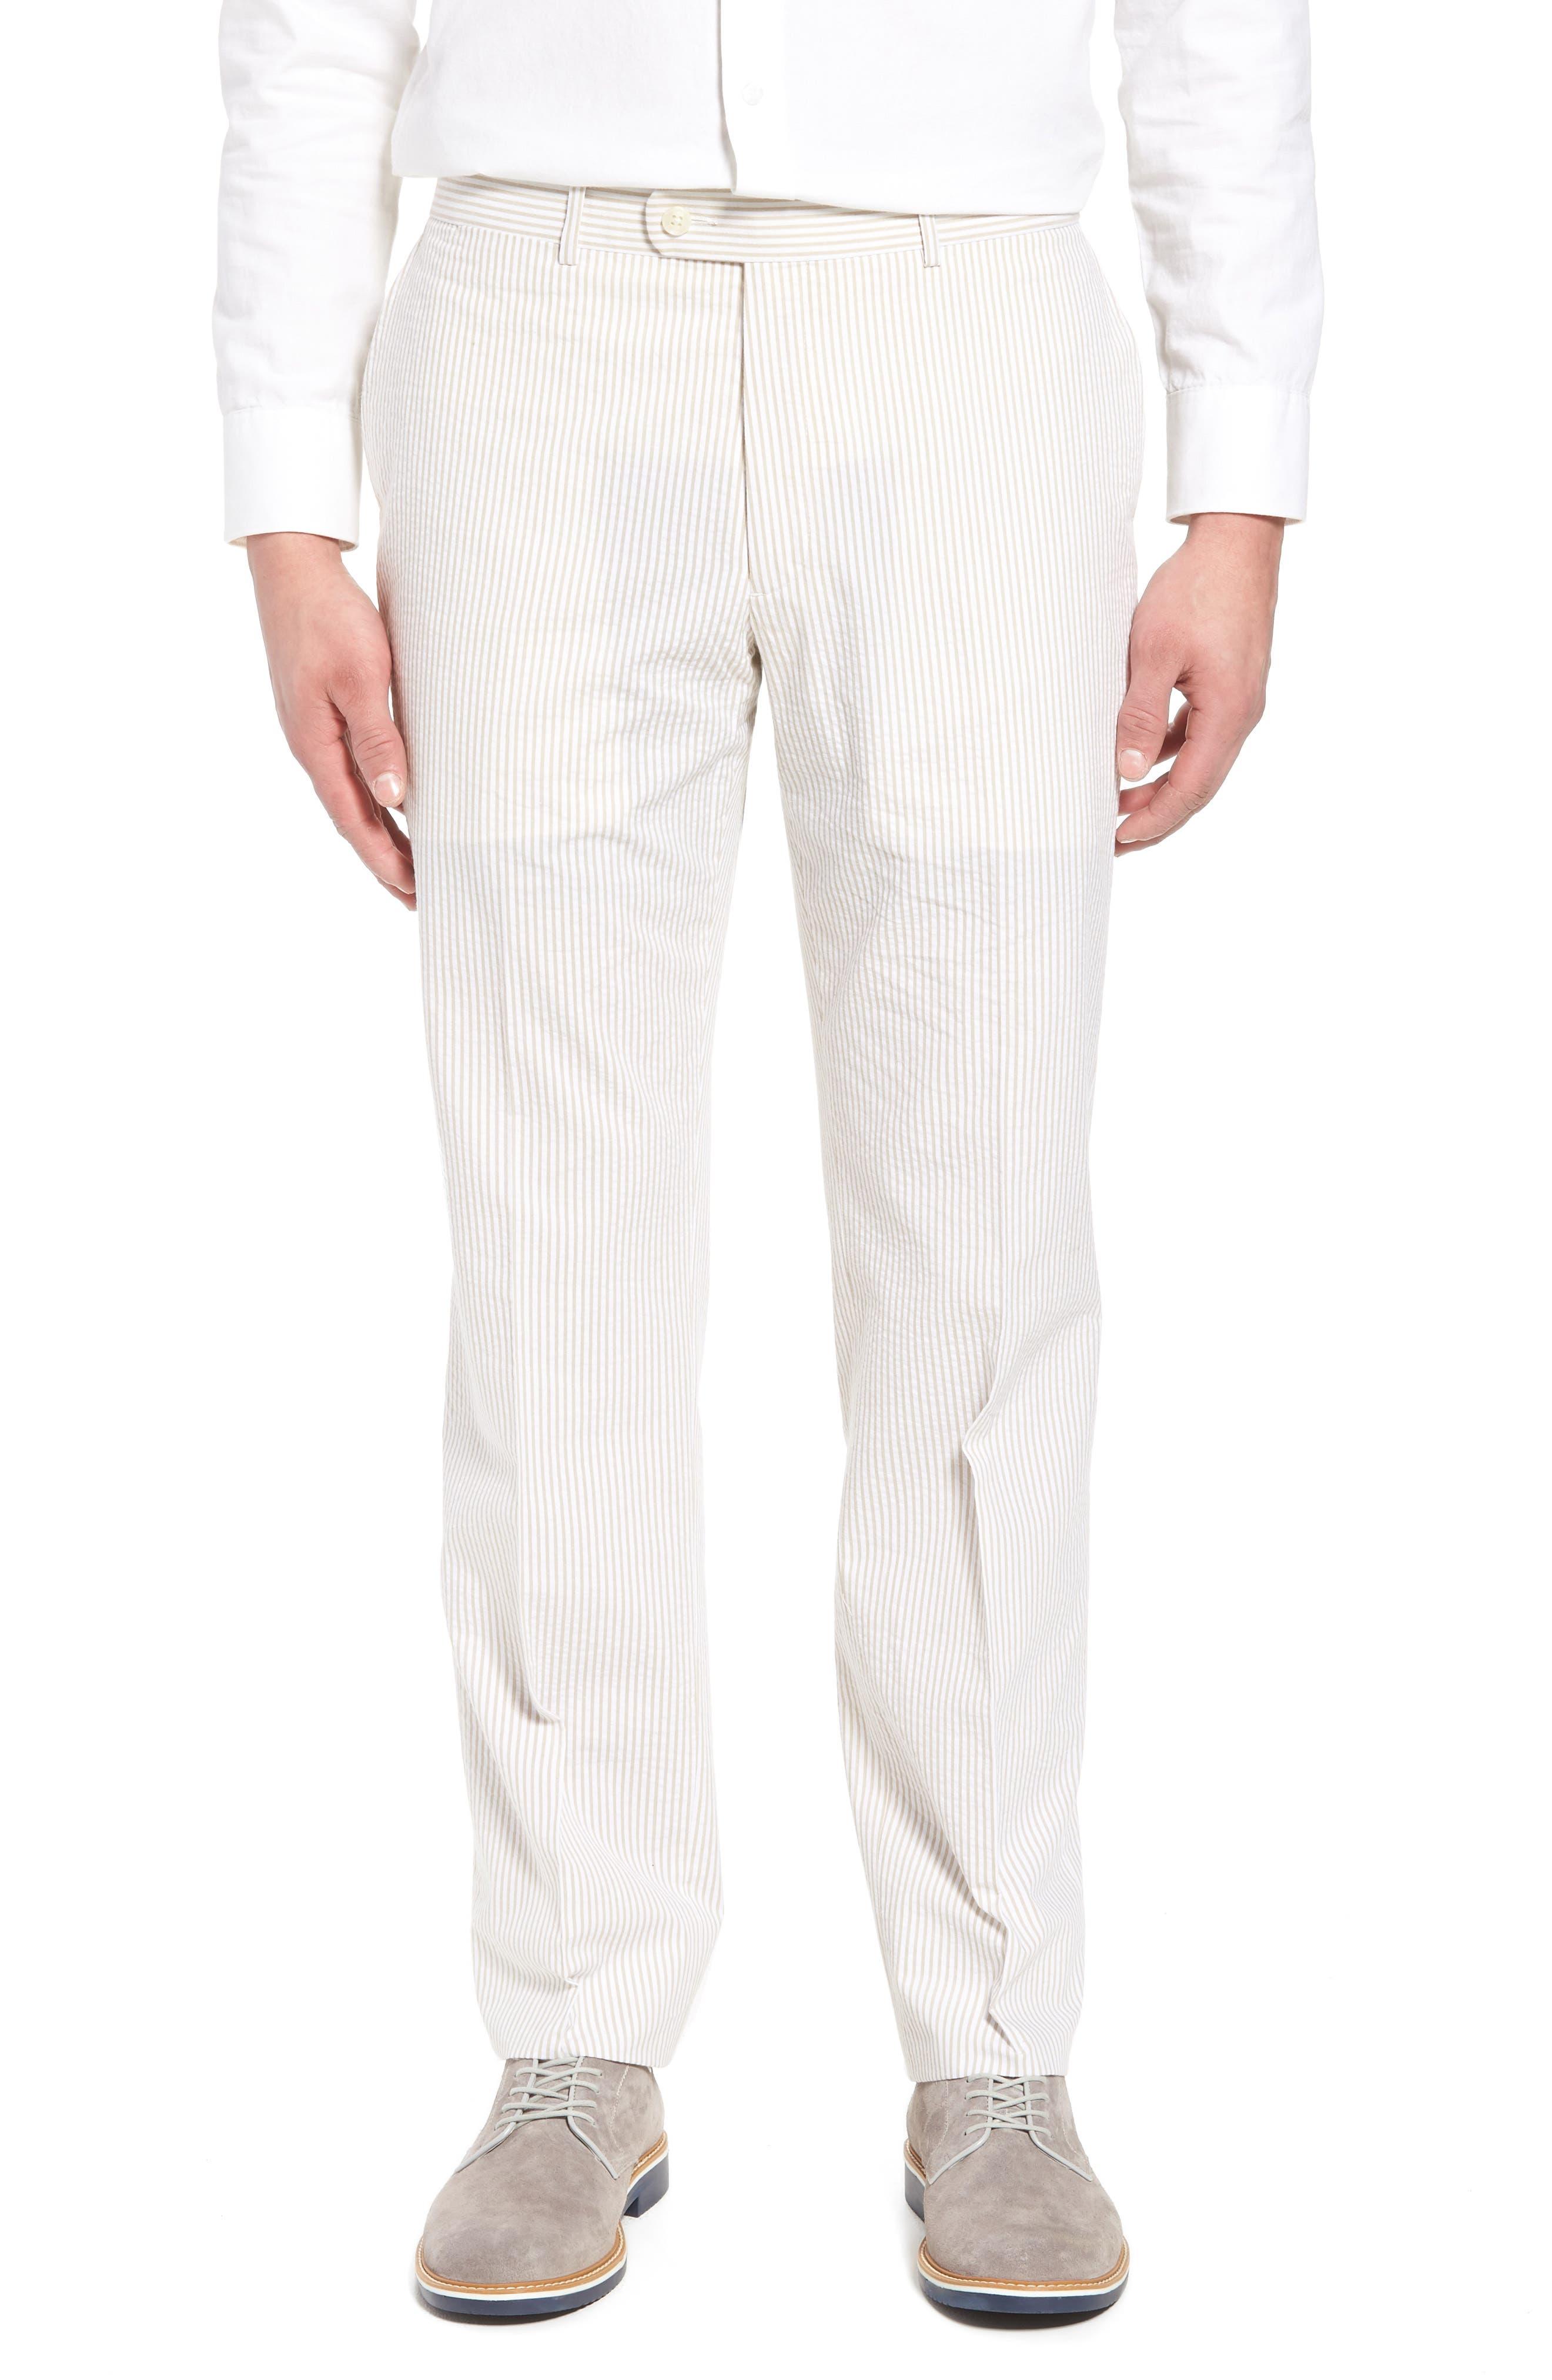 Andrew AIM Flat Front Seersucker Trousers,                         Main,                         color, 250